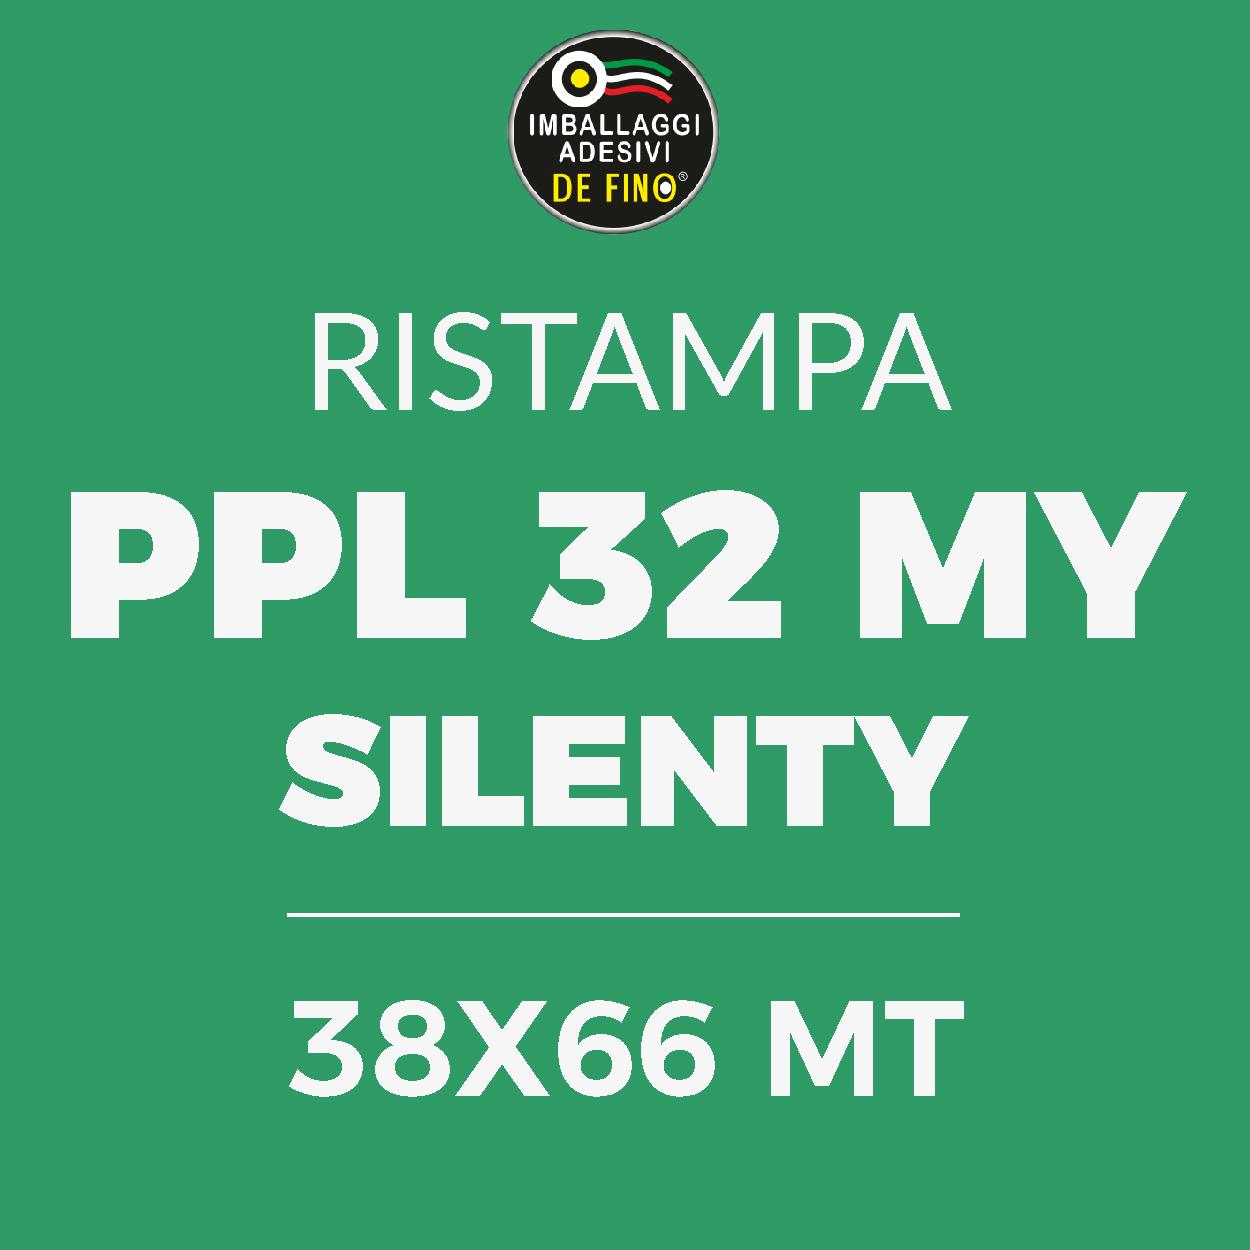 RISTAMPA PPL 38X66 MT - 02-01